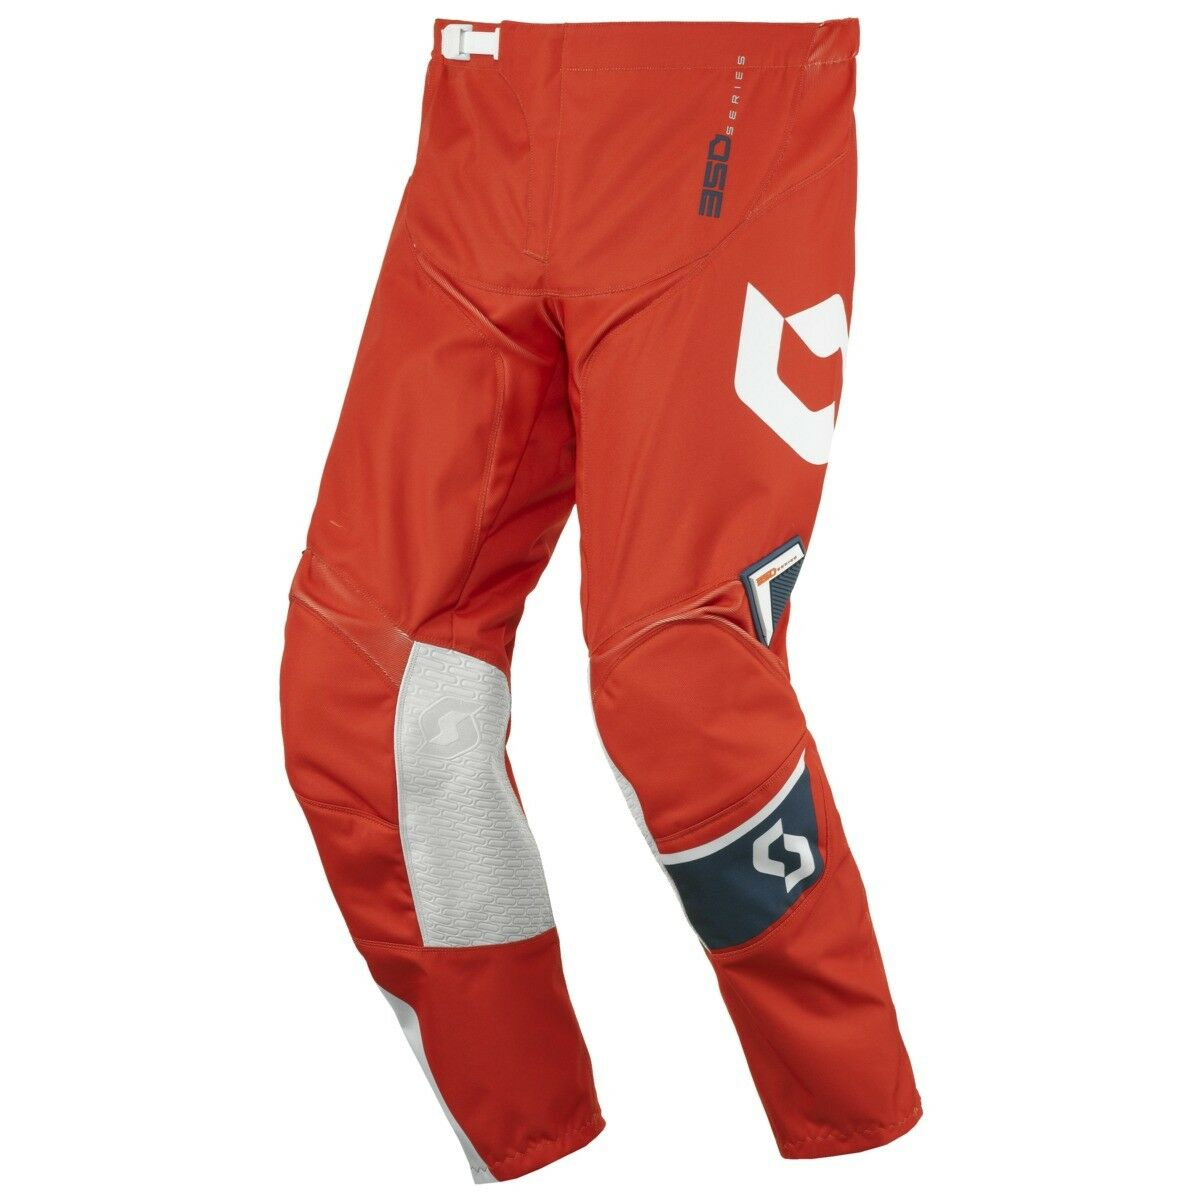 Scott 350 Dirt MX Motocross   DH DH DH Fahrrad Hose Orange 2016 67e401